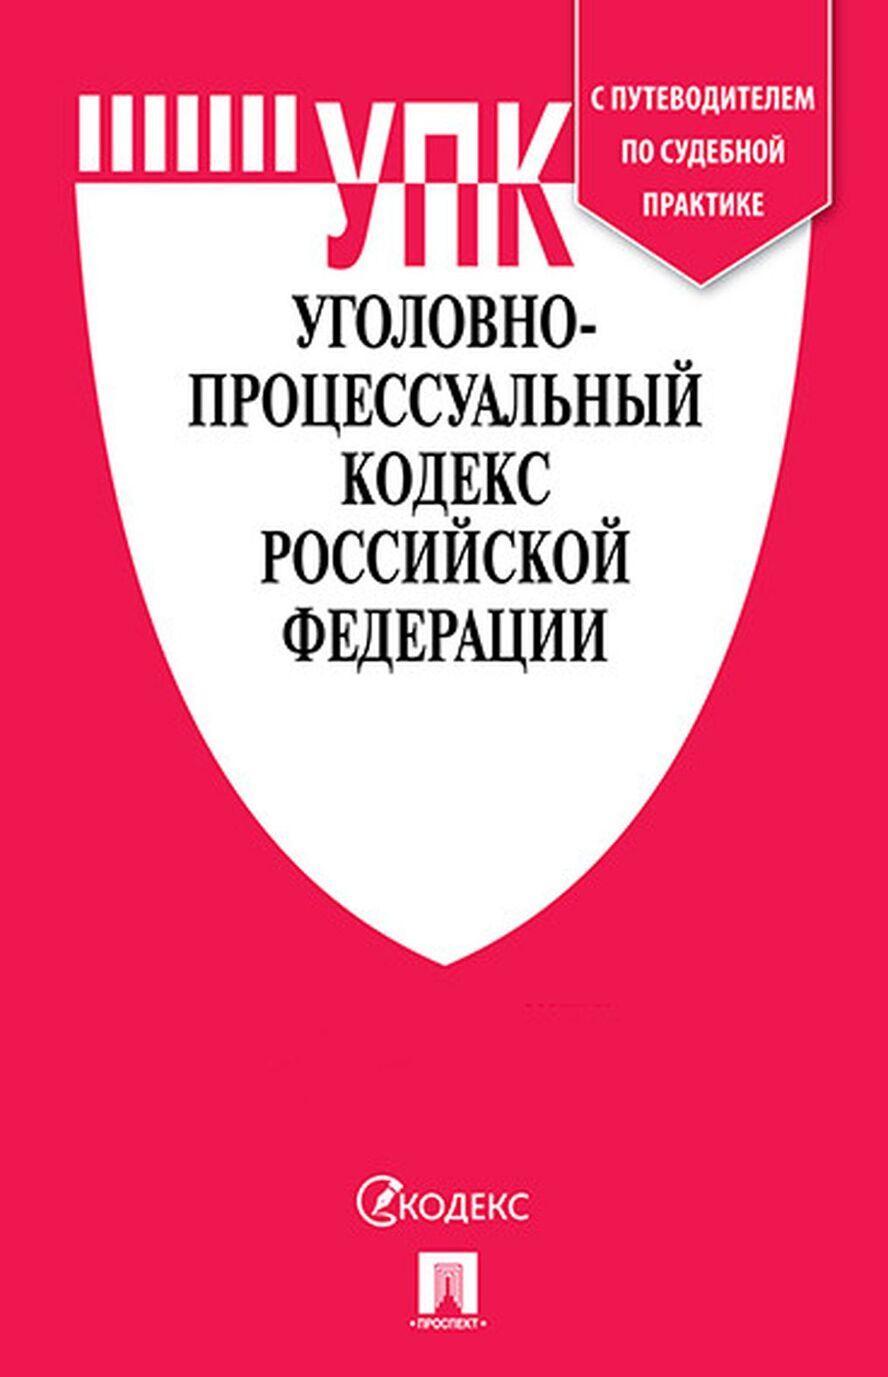 Ugolovno-protsessualnyj kodeks Rossijskoj Federatsii